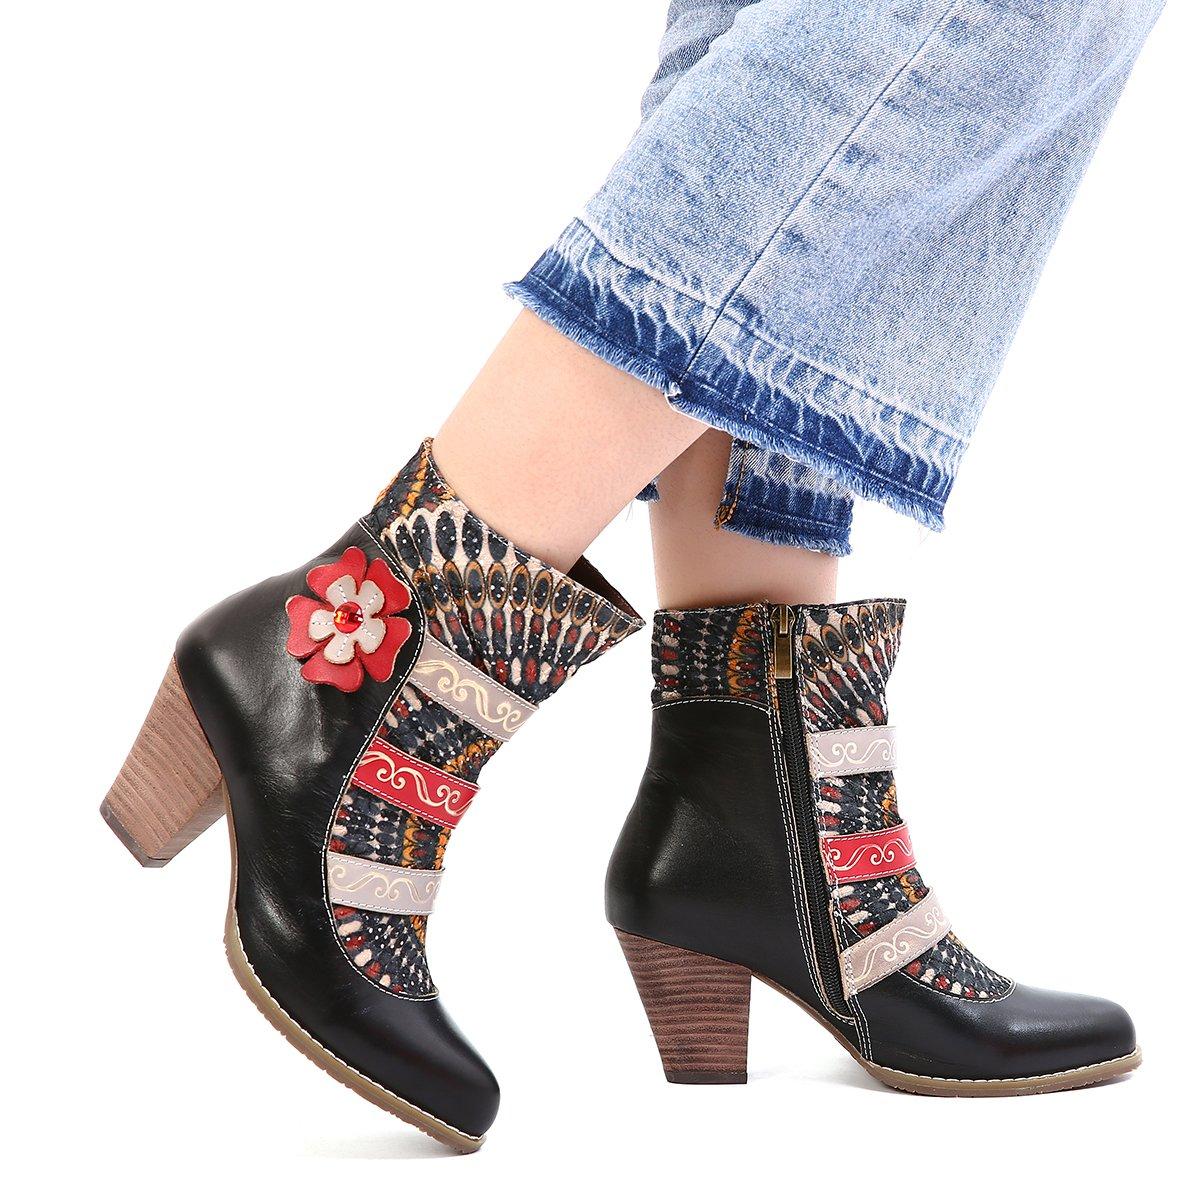 Gracosy Damen Stiefeletten Bunt Schuhe Damen Herbst Leder Stiefel Bedruckt Retro Handgemachtes Reißverschluss Schuhe High-Top Block Ferse Rutschfest Bequeme Arbeitsschuhe Stiefeletten mit Absatz